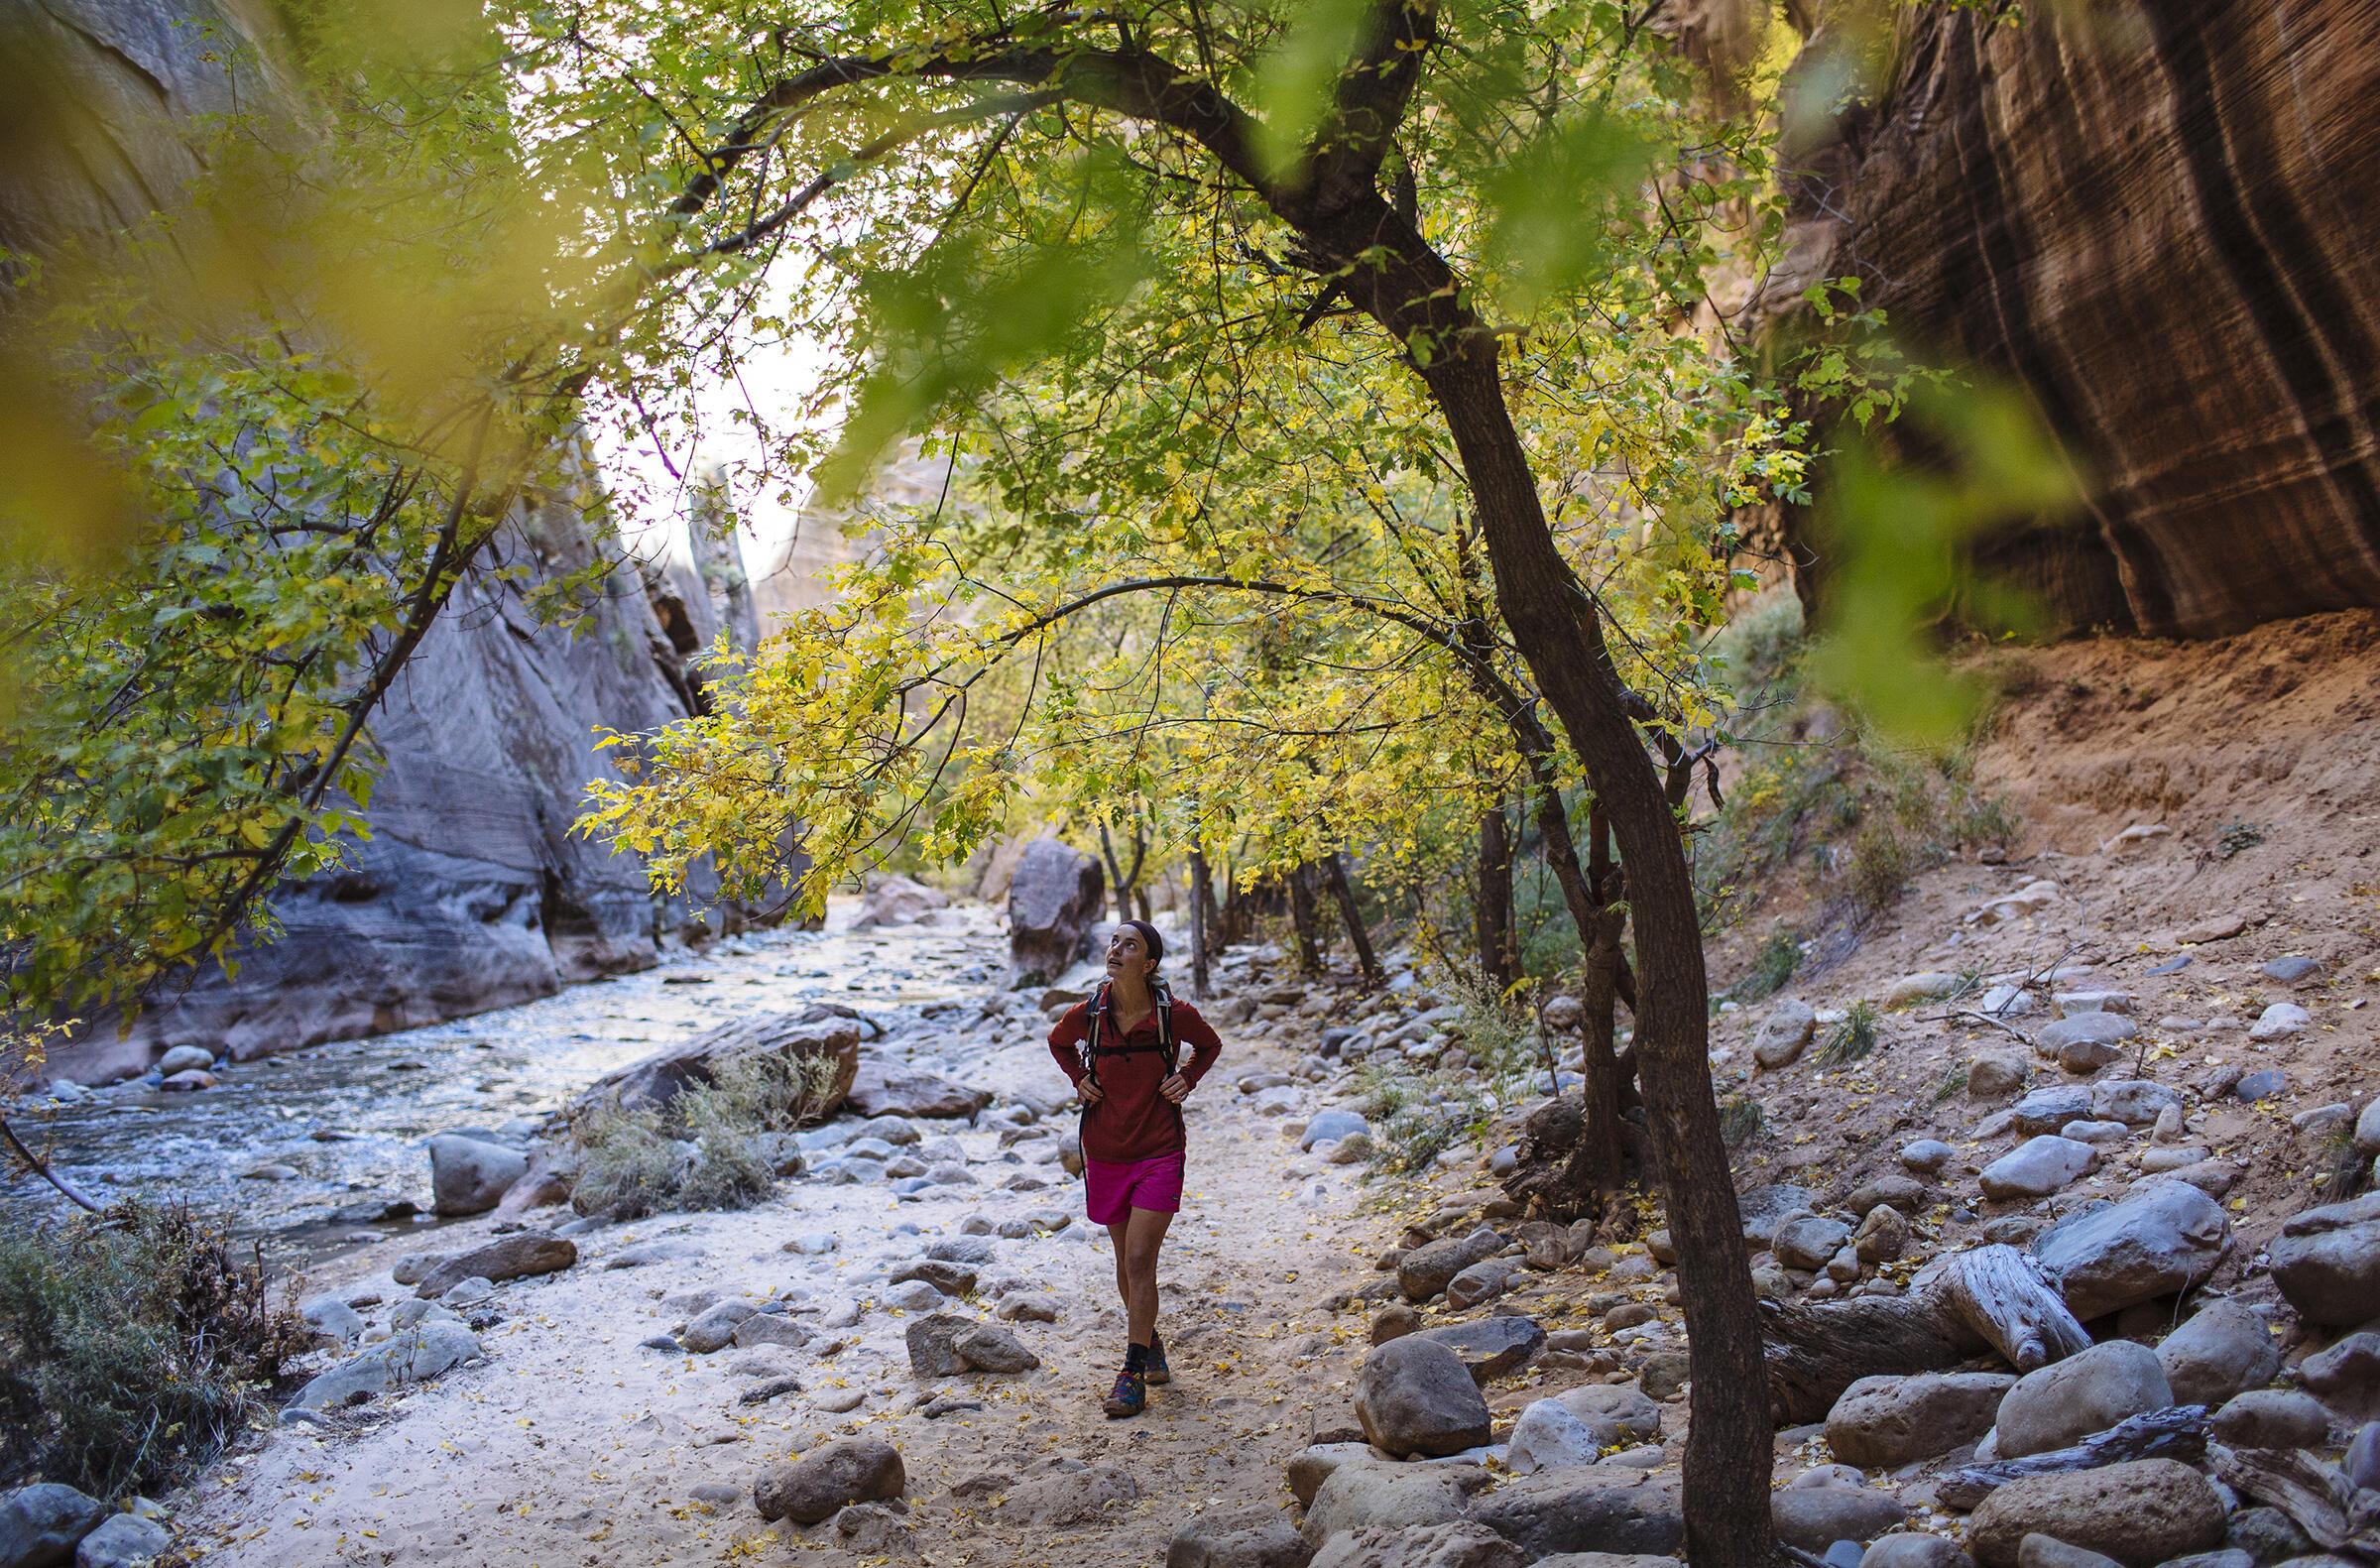 Zion National Park, Utah. Matthew Van Biene/Tandemstock.com